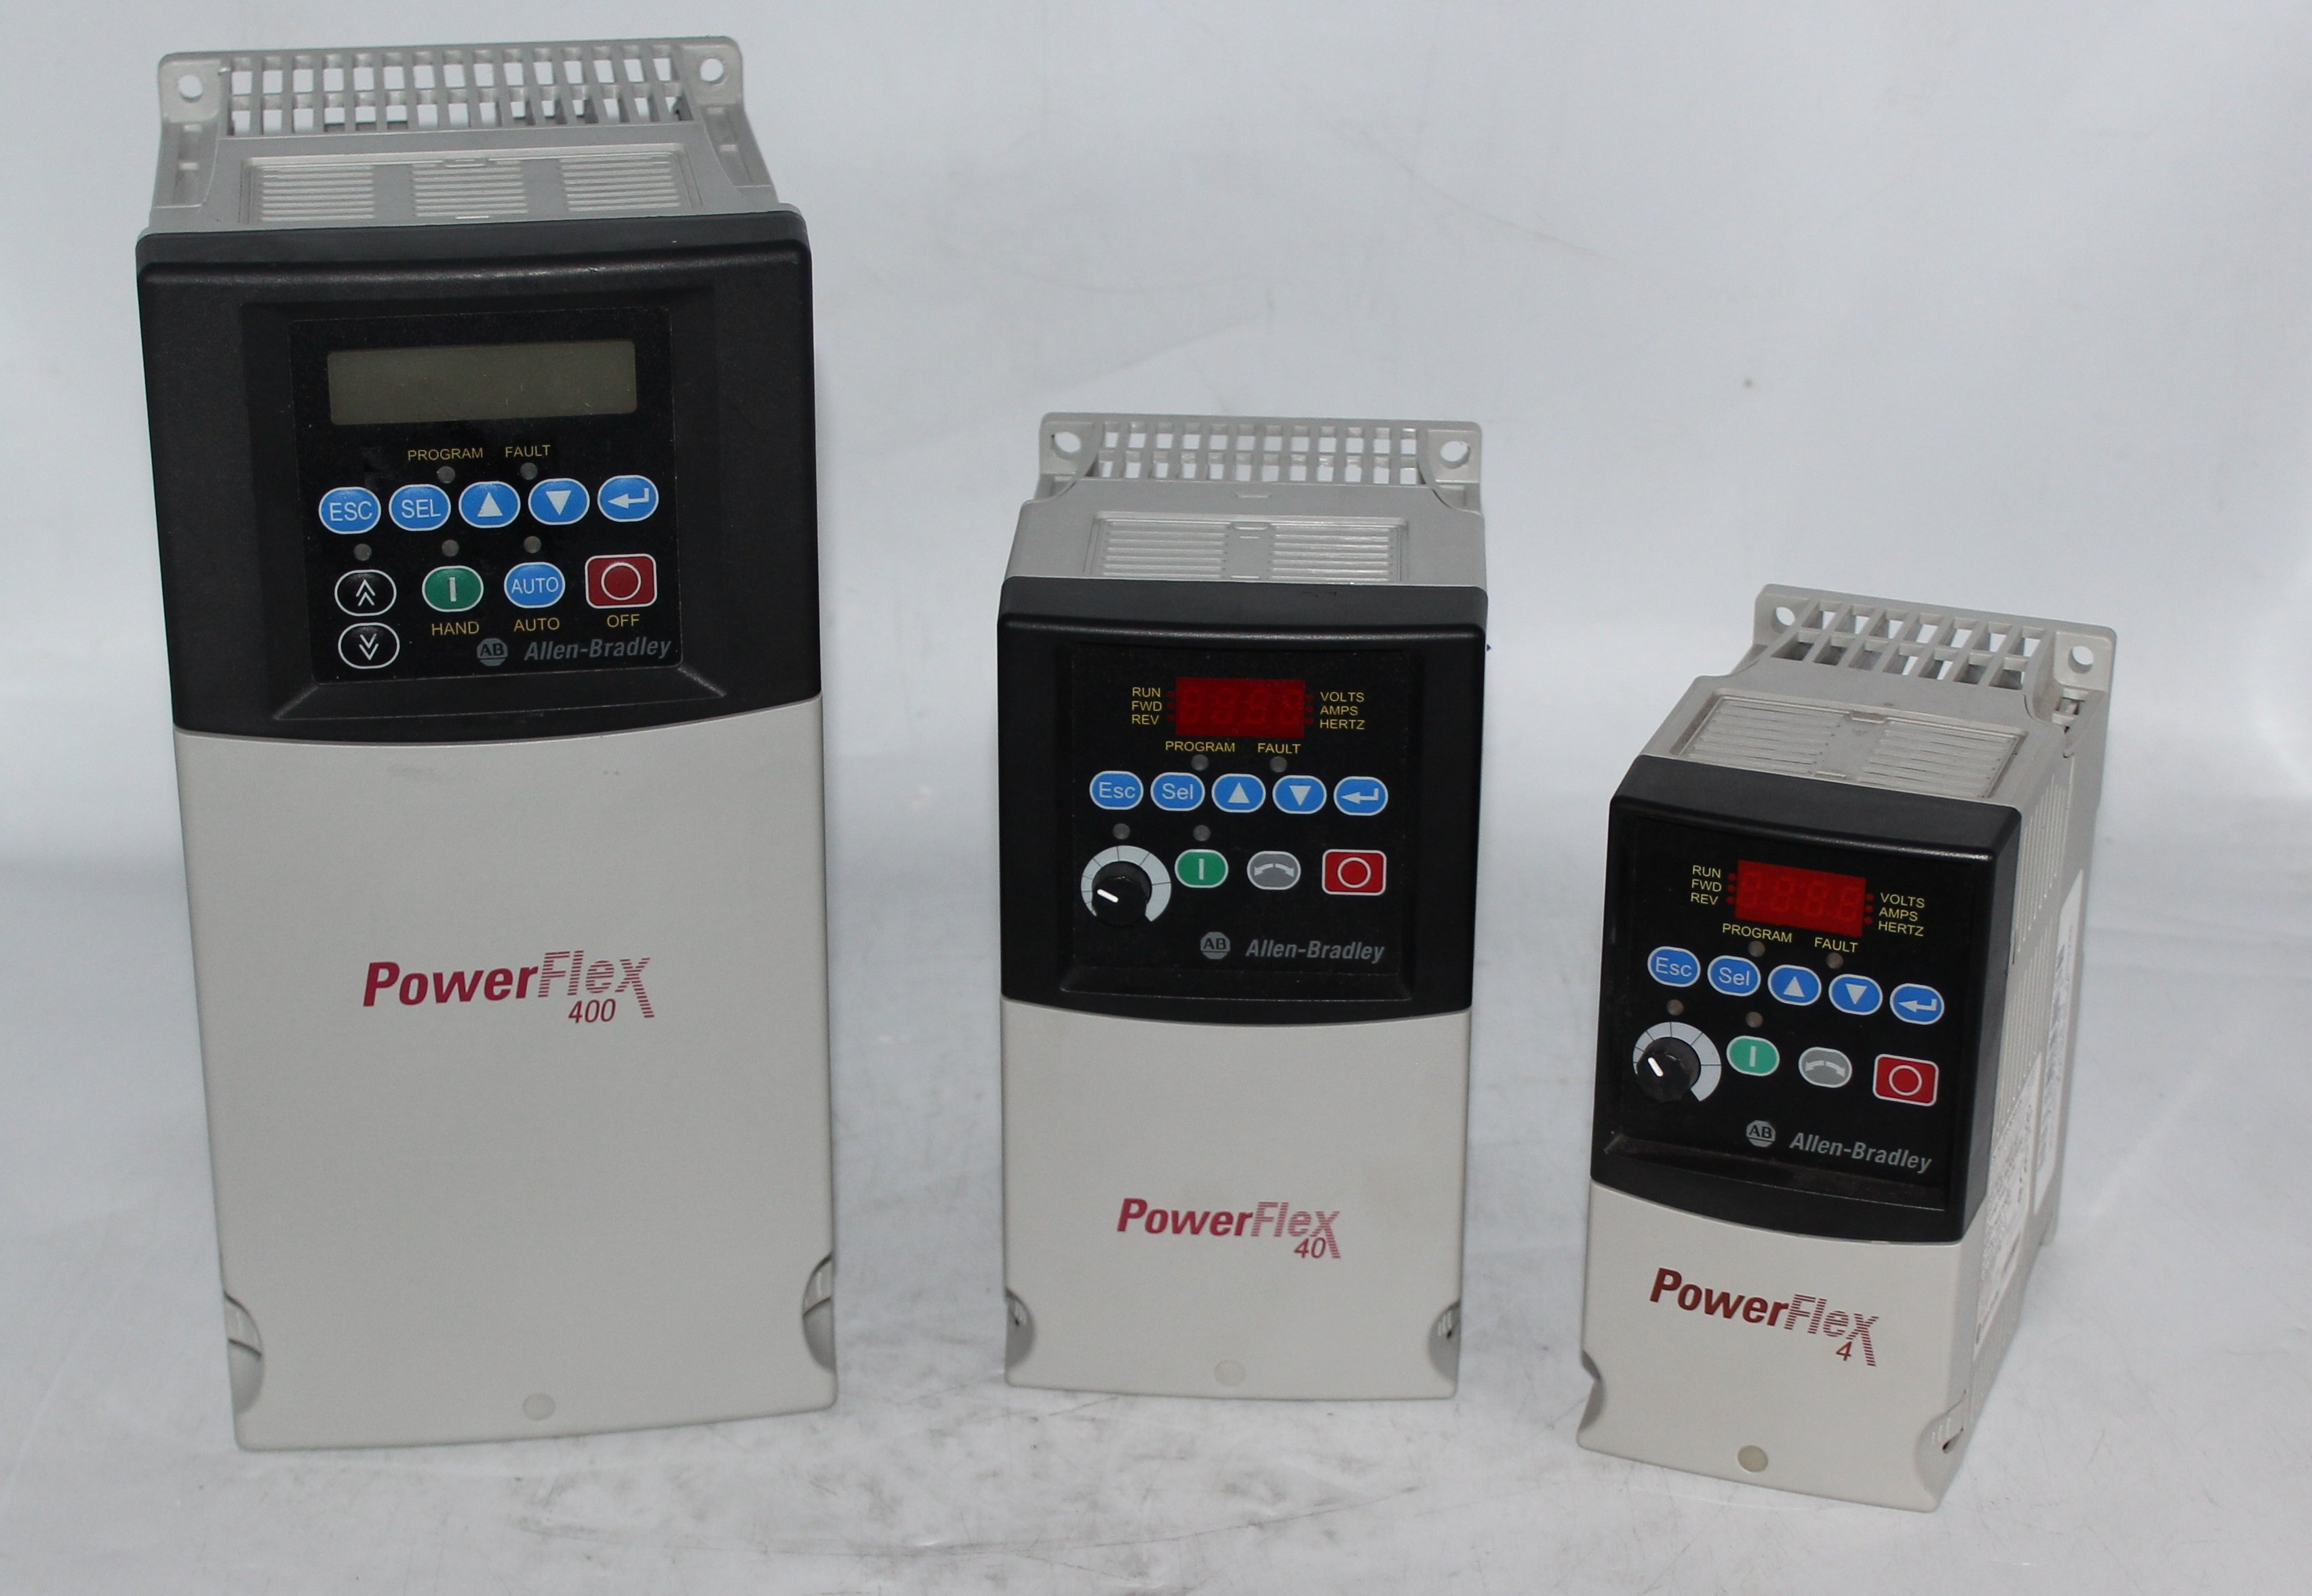 Hardware Comparison: PowerFlex 4, 40, and 400 Drives